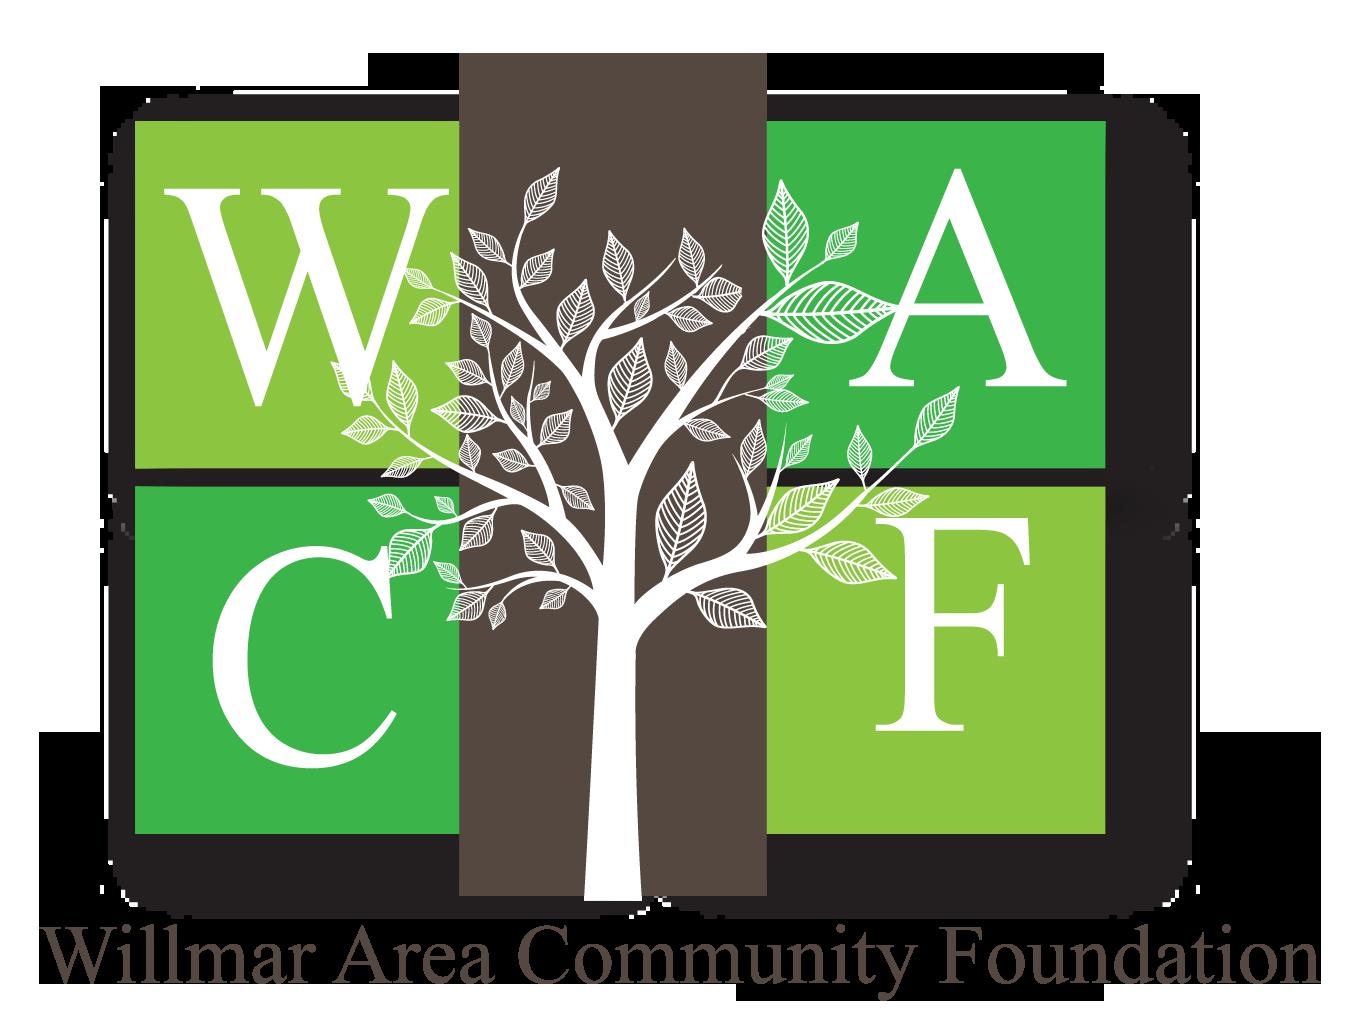 Willmar Area Community Foundation